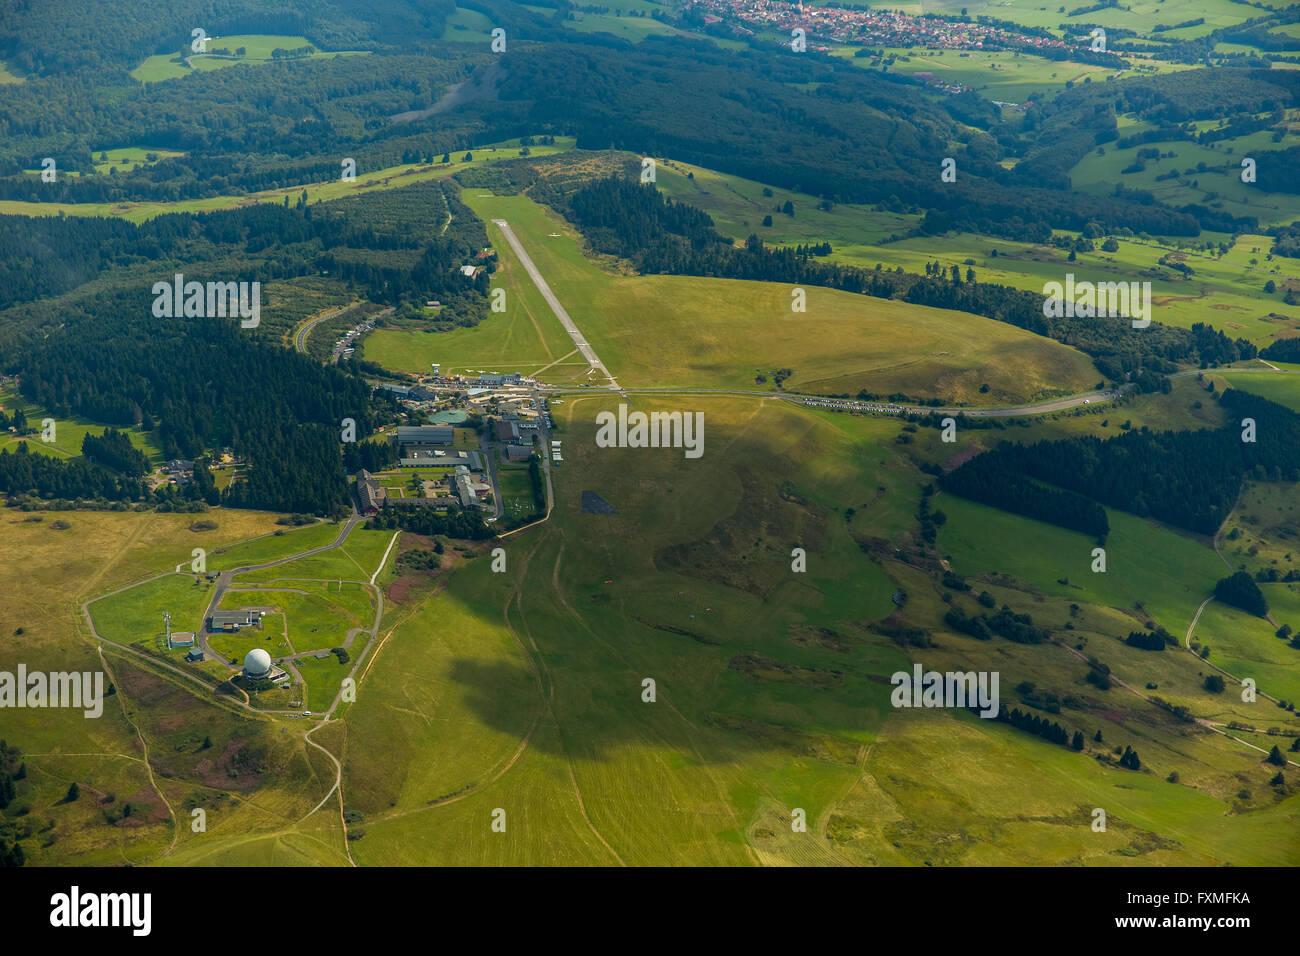 Aerial view, gliding center, German Gliding Museum, Wasserkuppe in the Hessian district of Fulda, Poppenhausen (Wasserkuppe) - Stock Image